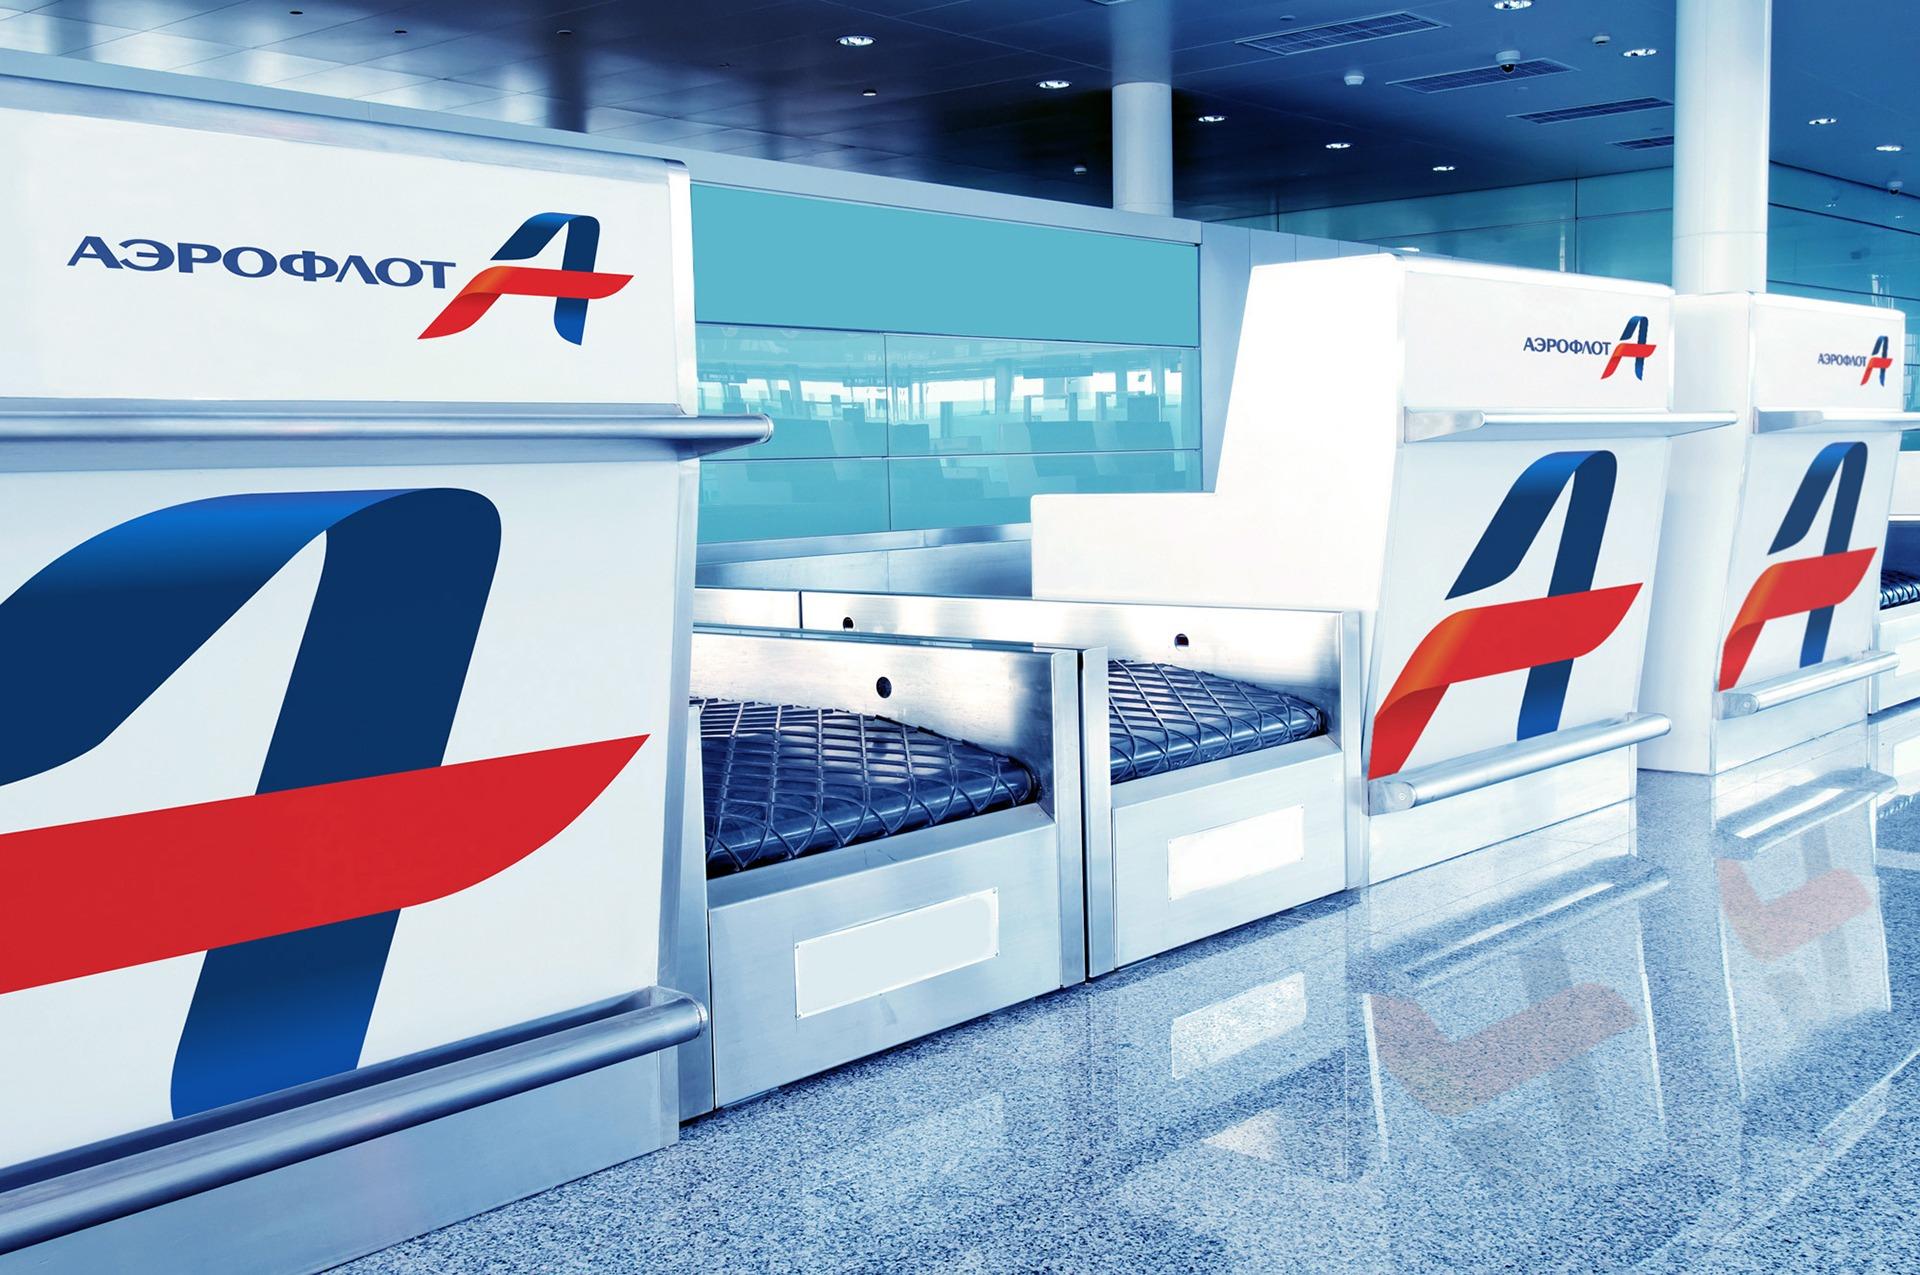 Aeroflot identity, фирменный стиль авиакомпании, Asgard Branding, лого Аэрофлот, airlines logo